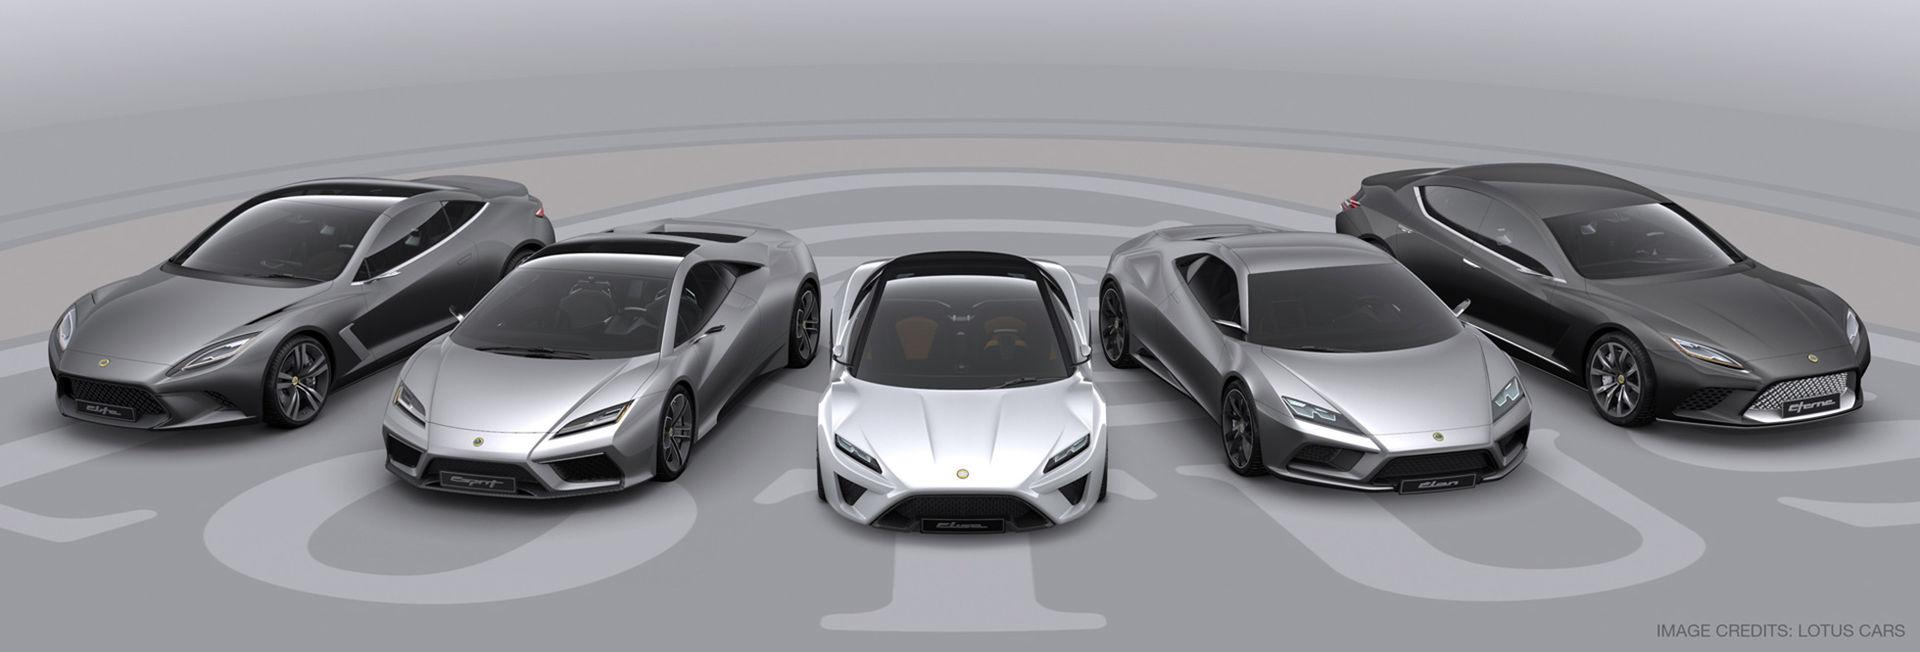 Lotus håller på med en eldriven superbil